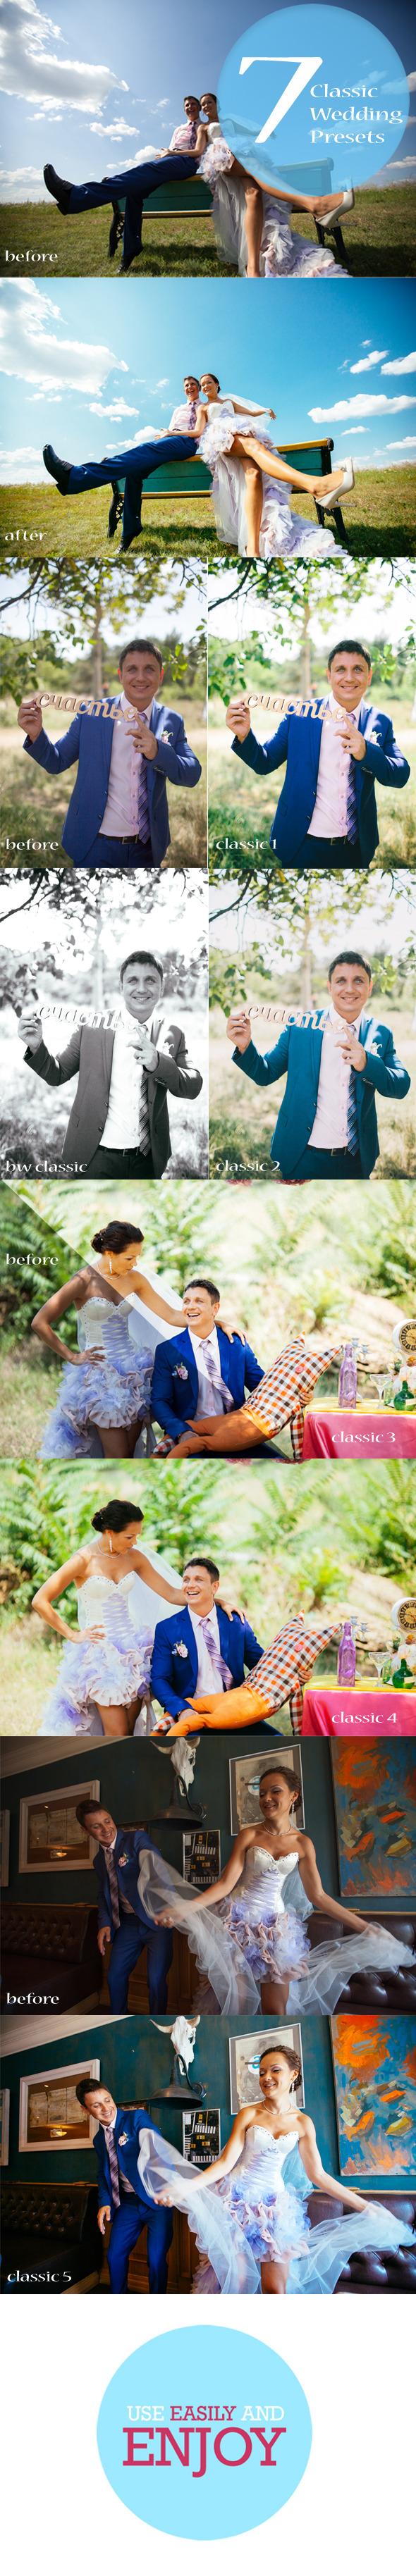 7 Wedding Valentine Presets - Wedding Lightroom Presets